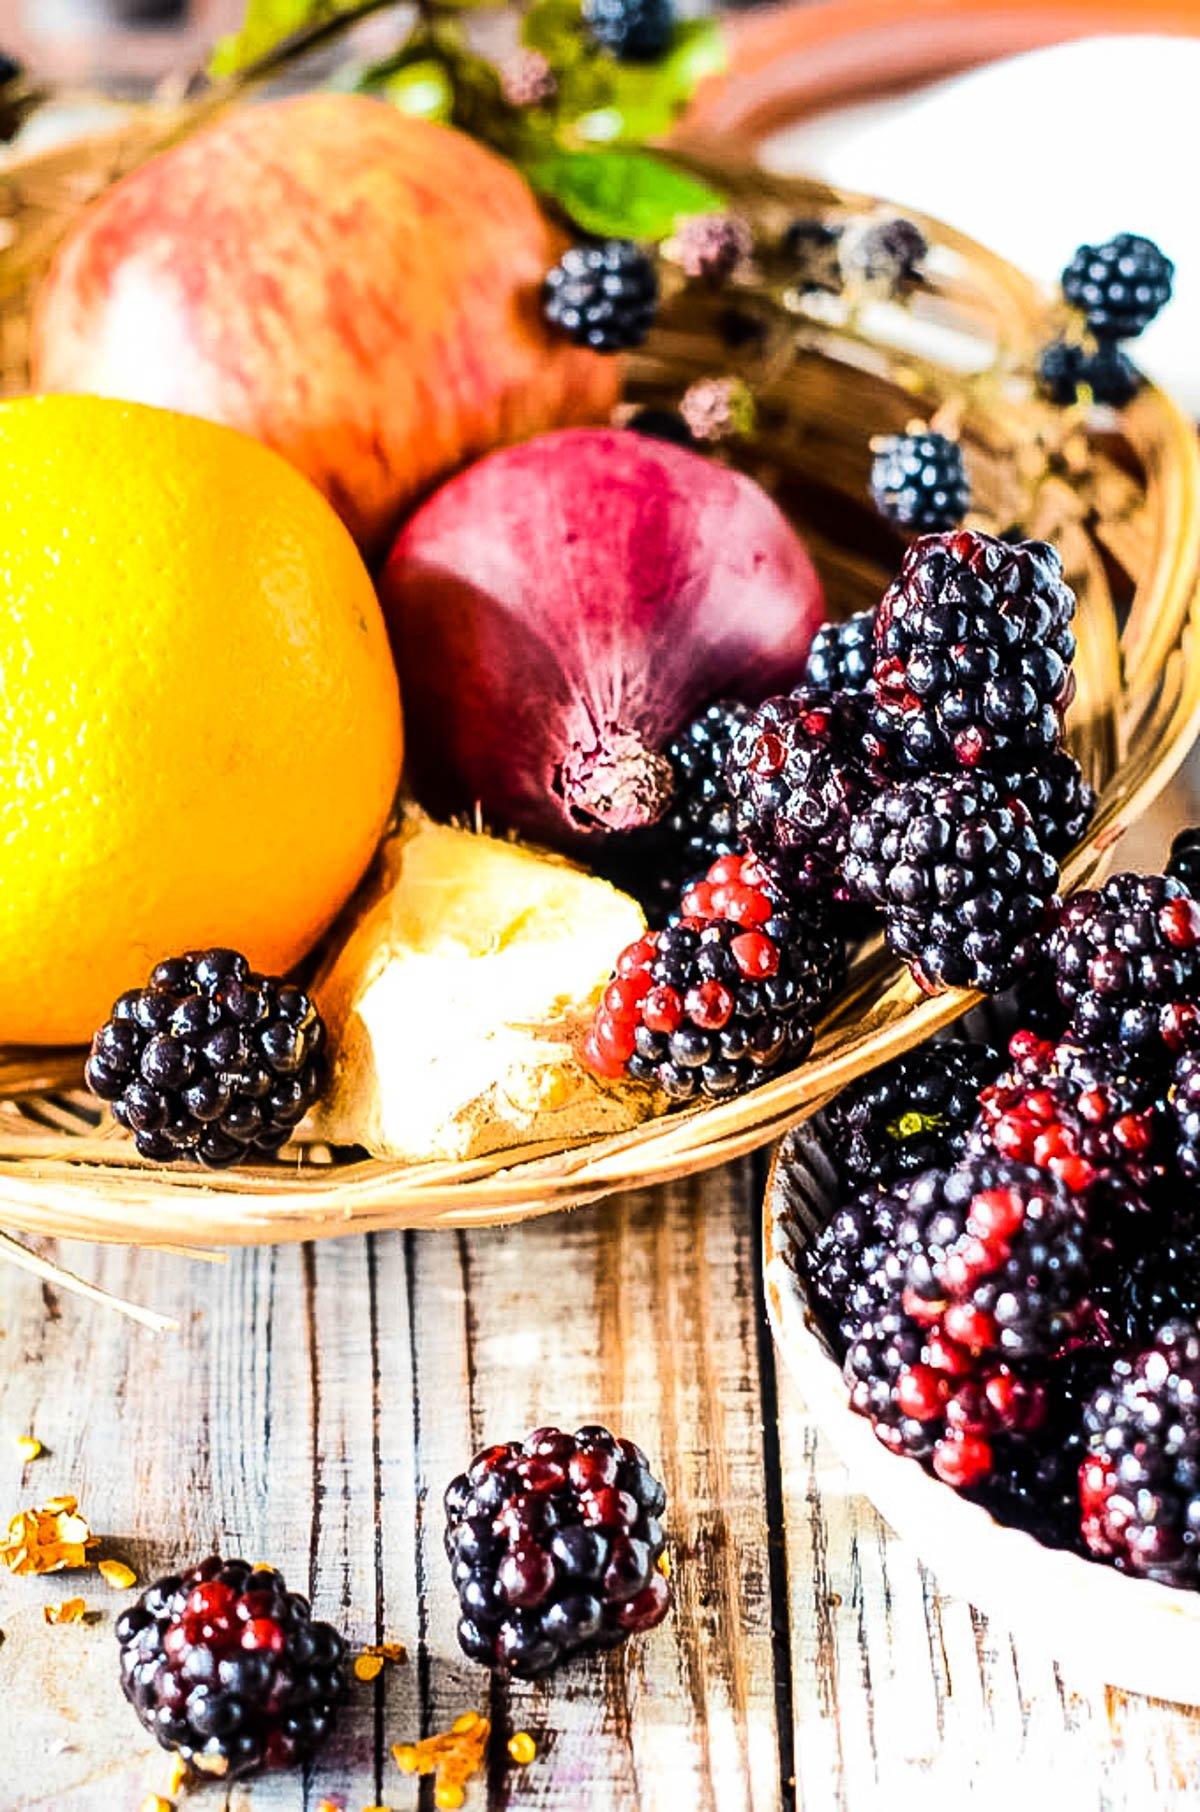 ingredients for blackberry chutney